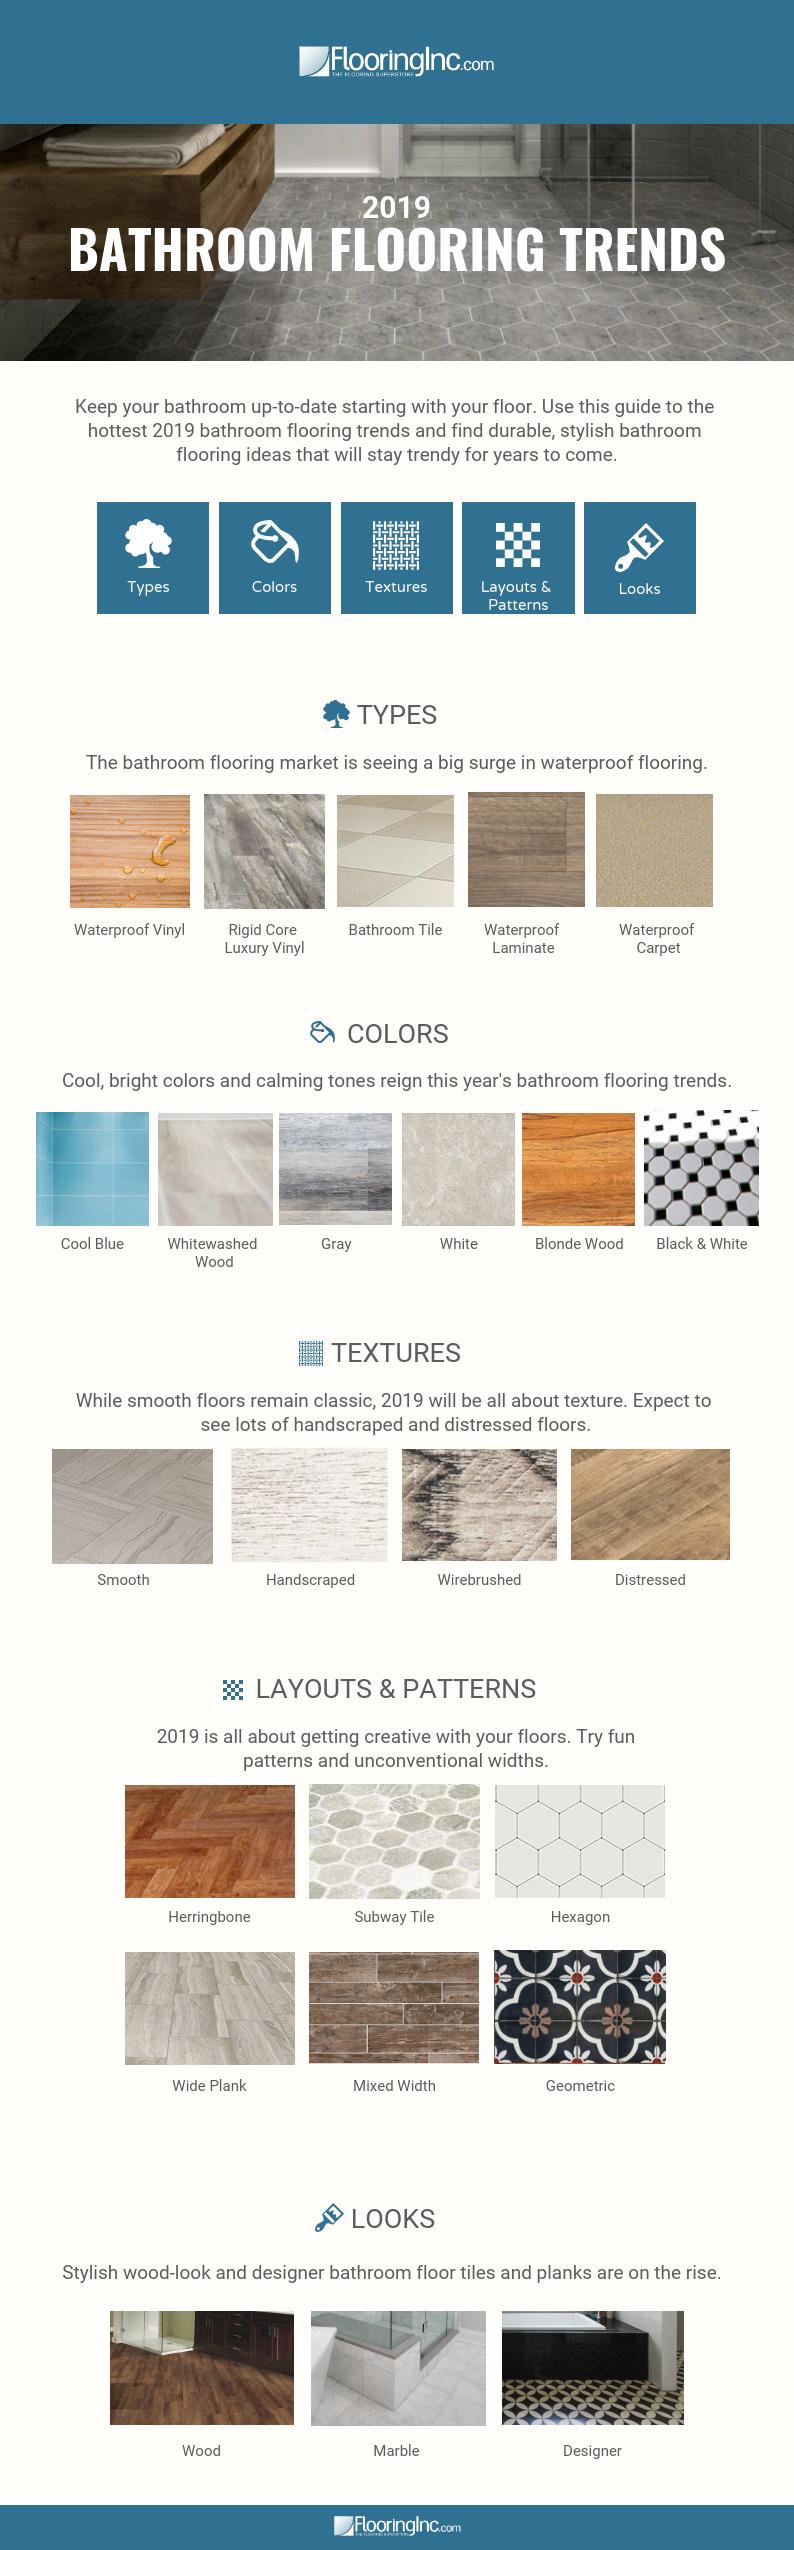 FlooringInc 2019 Bathroom Flooring Trends